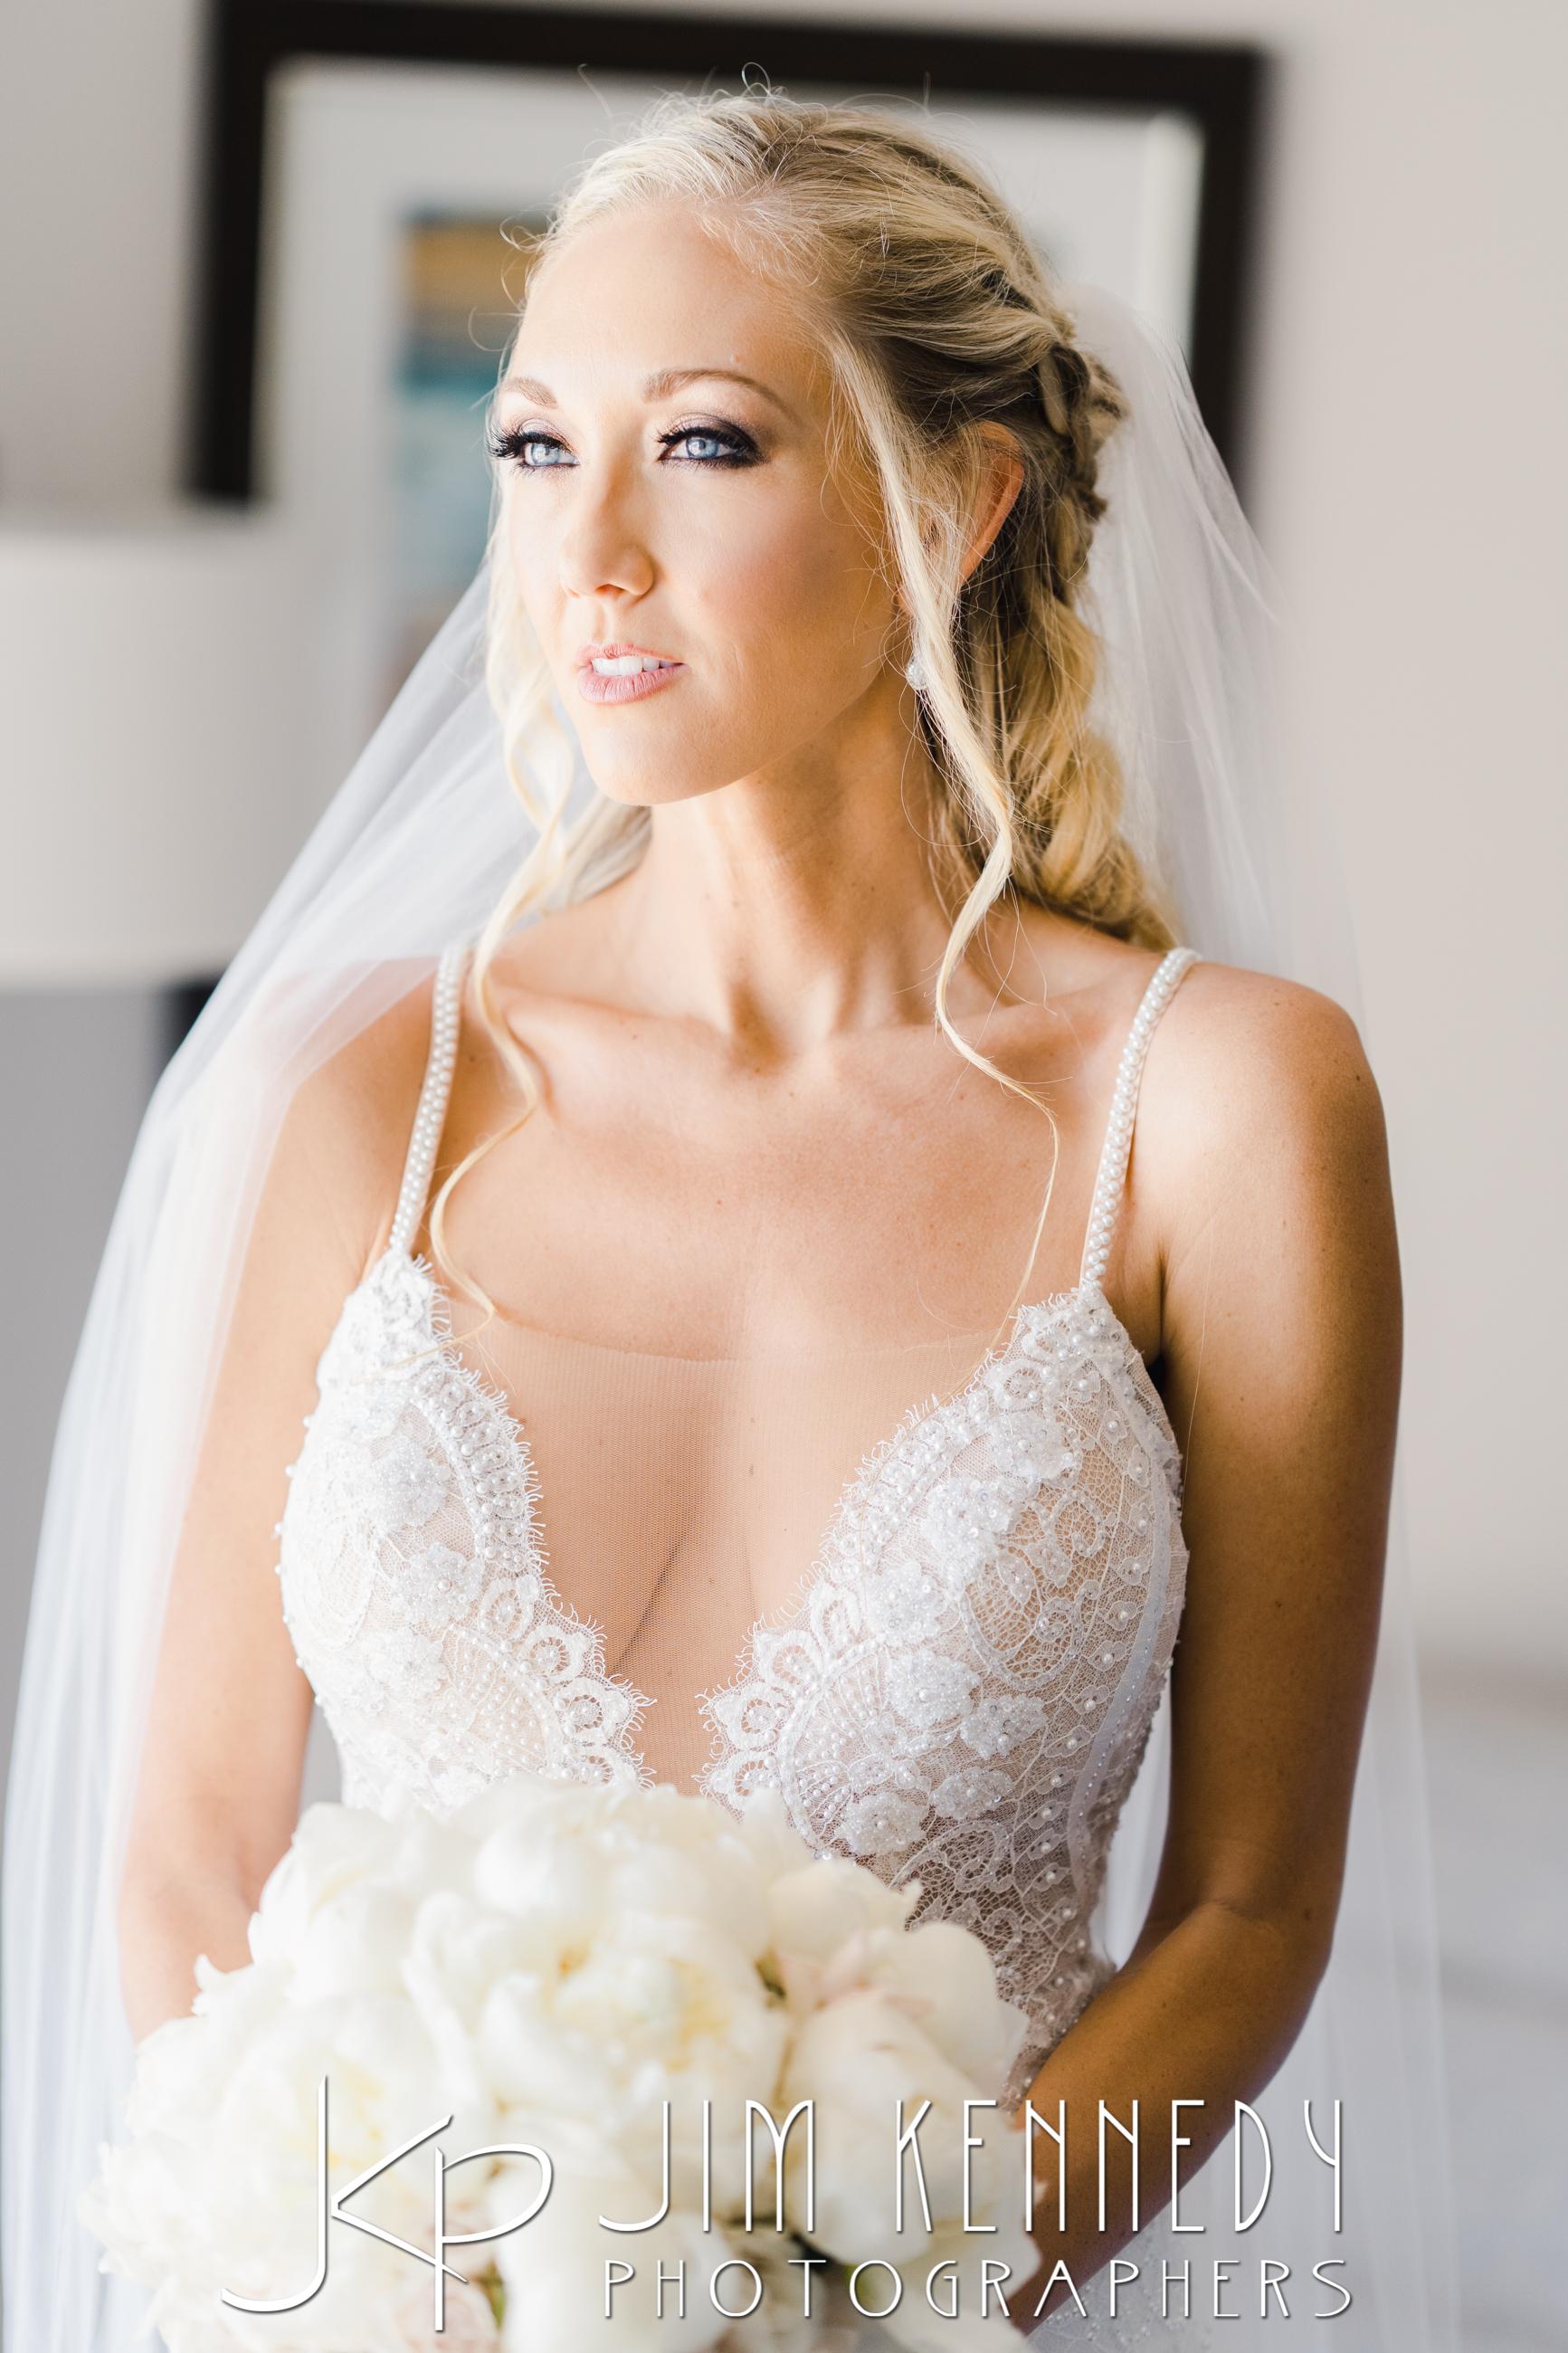 balboa-bay-resort-wedding-brooke-kevin_0045.JPG